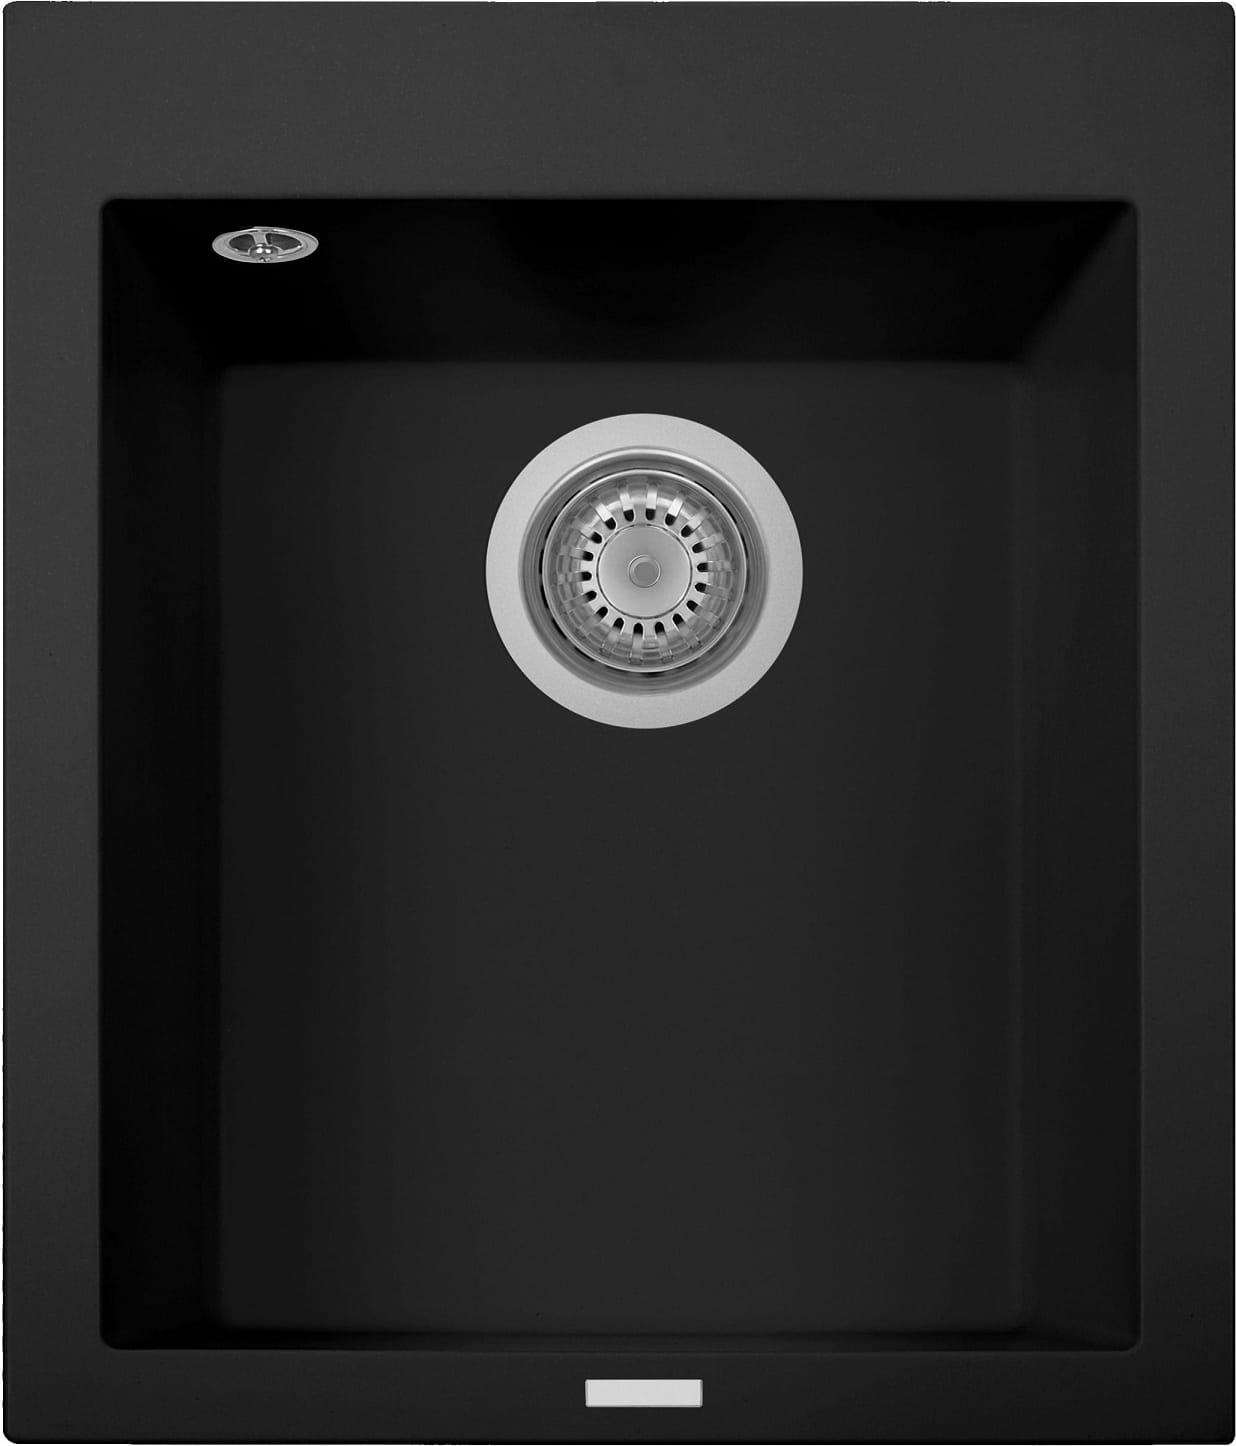 plados On4110 Ug70 Lavello Cucina Fragranite 1 Vasca Incasso Larghezza 41 Cm Materiale Ultragranit Colore Black Matt Ug70 - On4110 Serie One